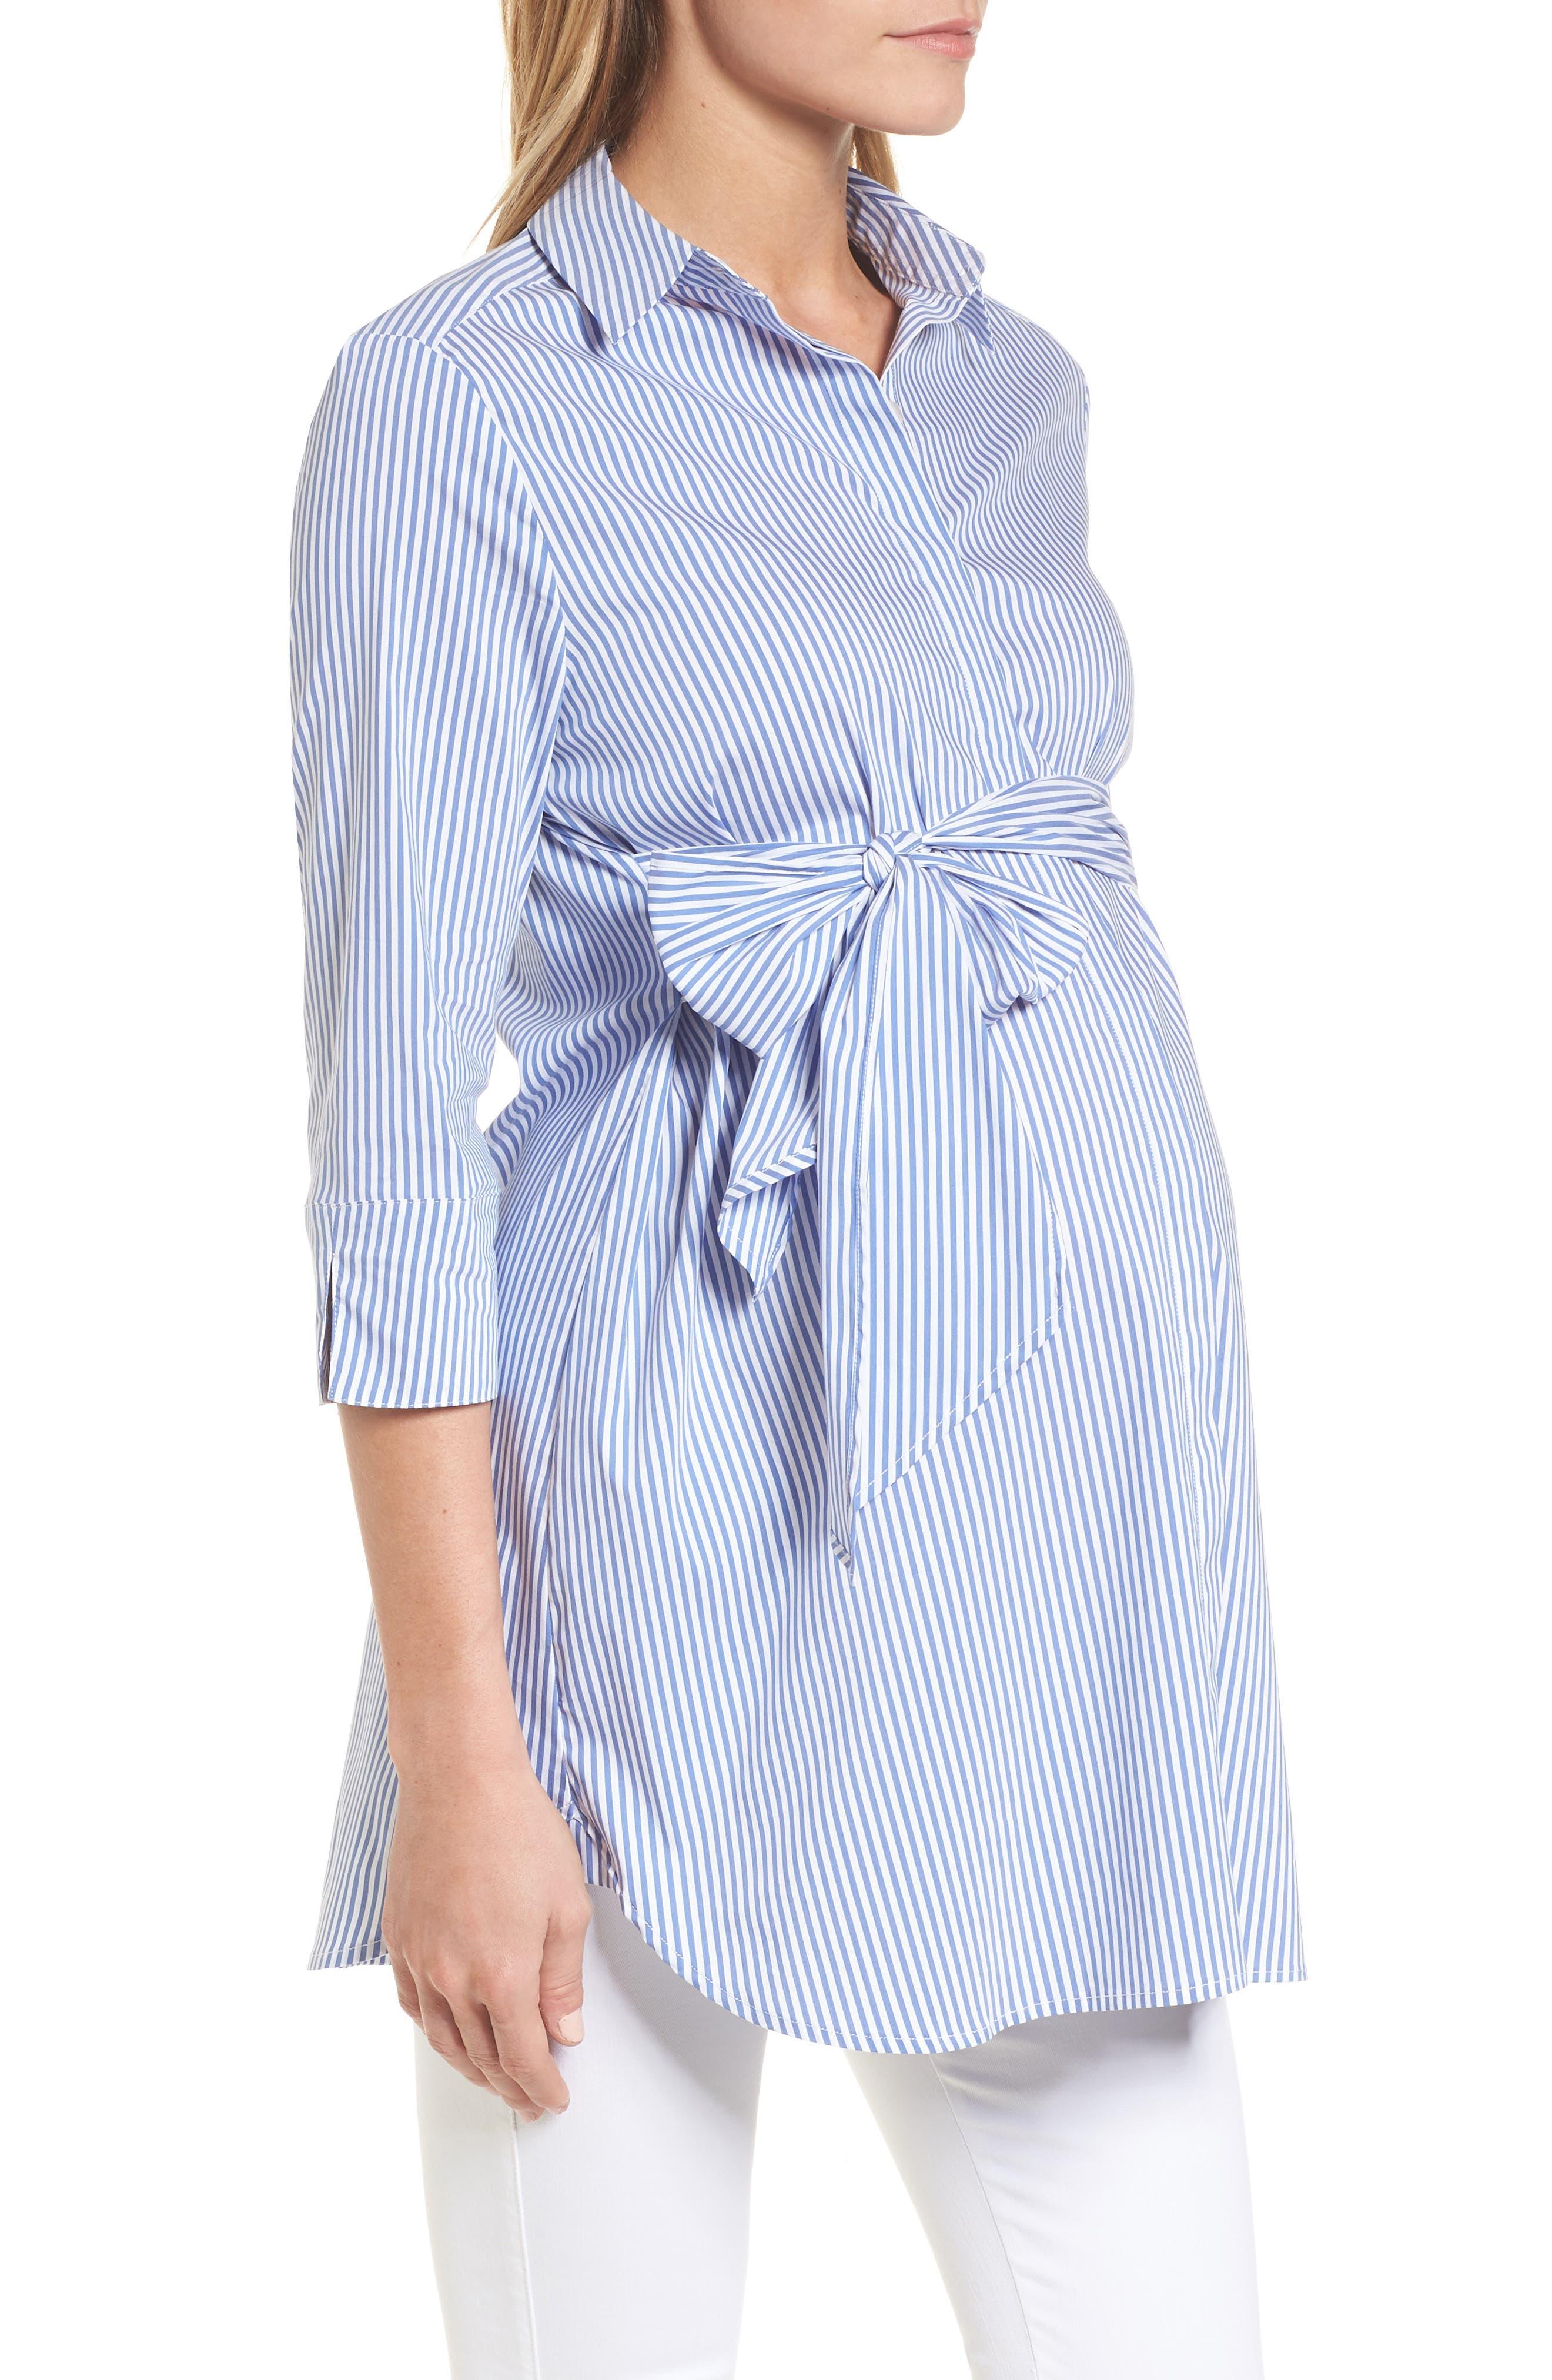 Dora Tie Front Maternity Shirt,                             Alternate thumbnail 4, color,                             Blue/White Stripe